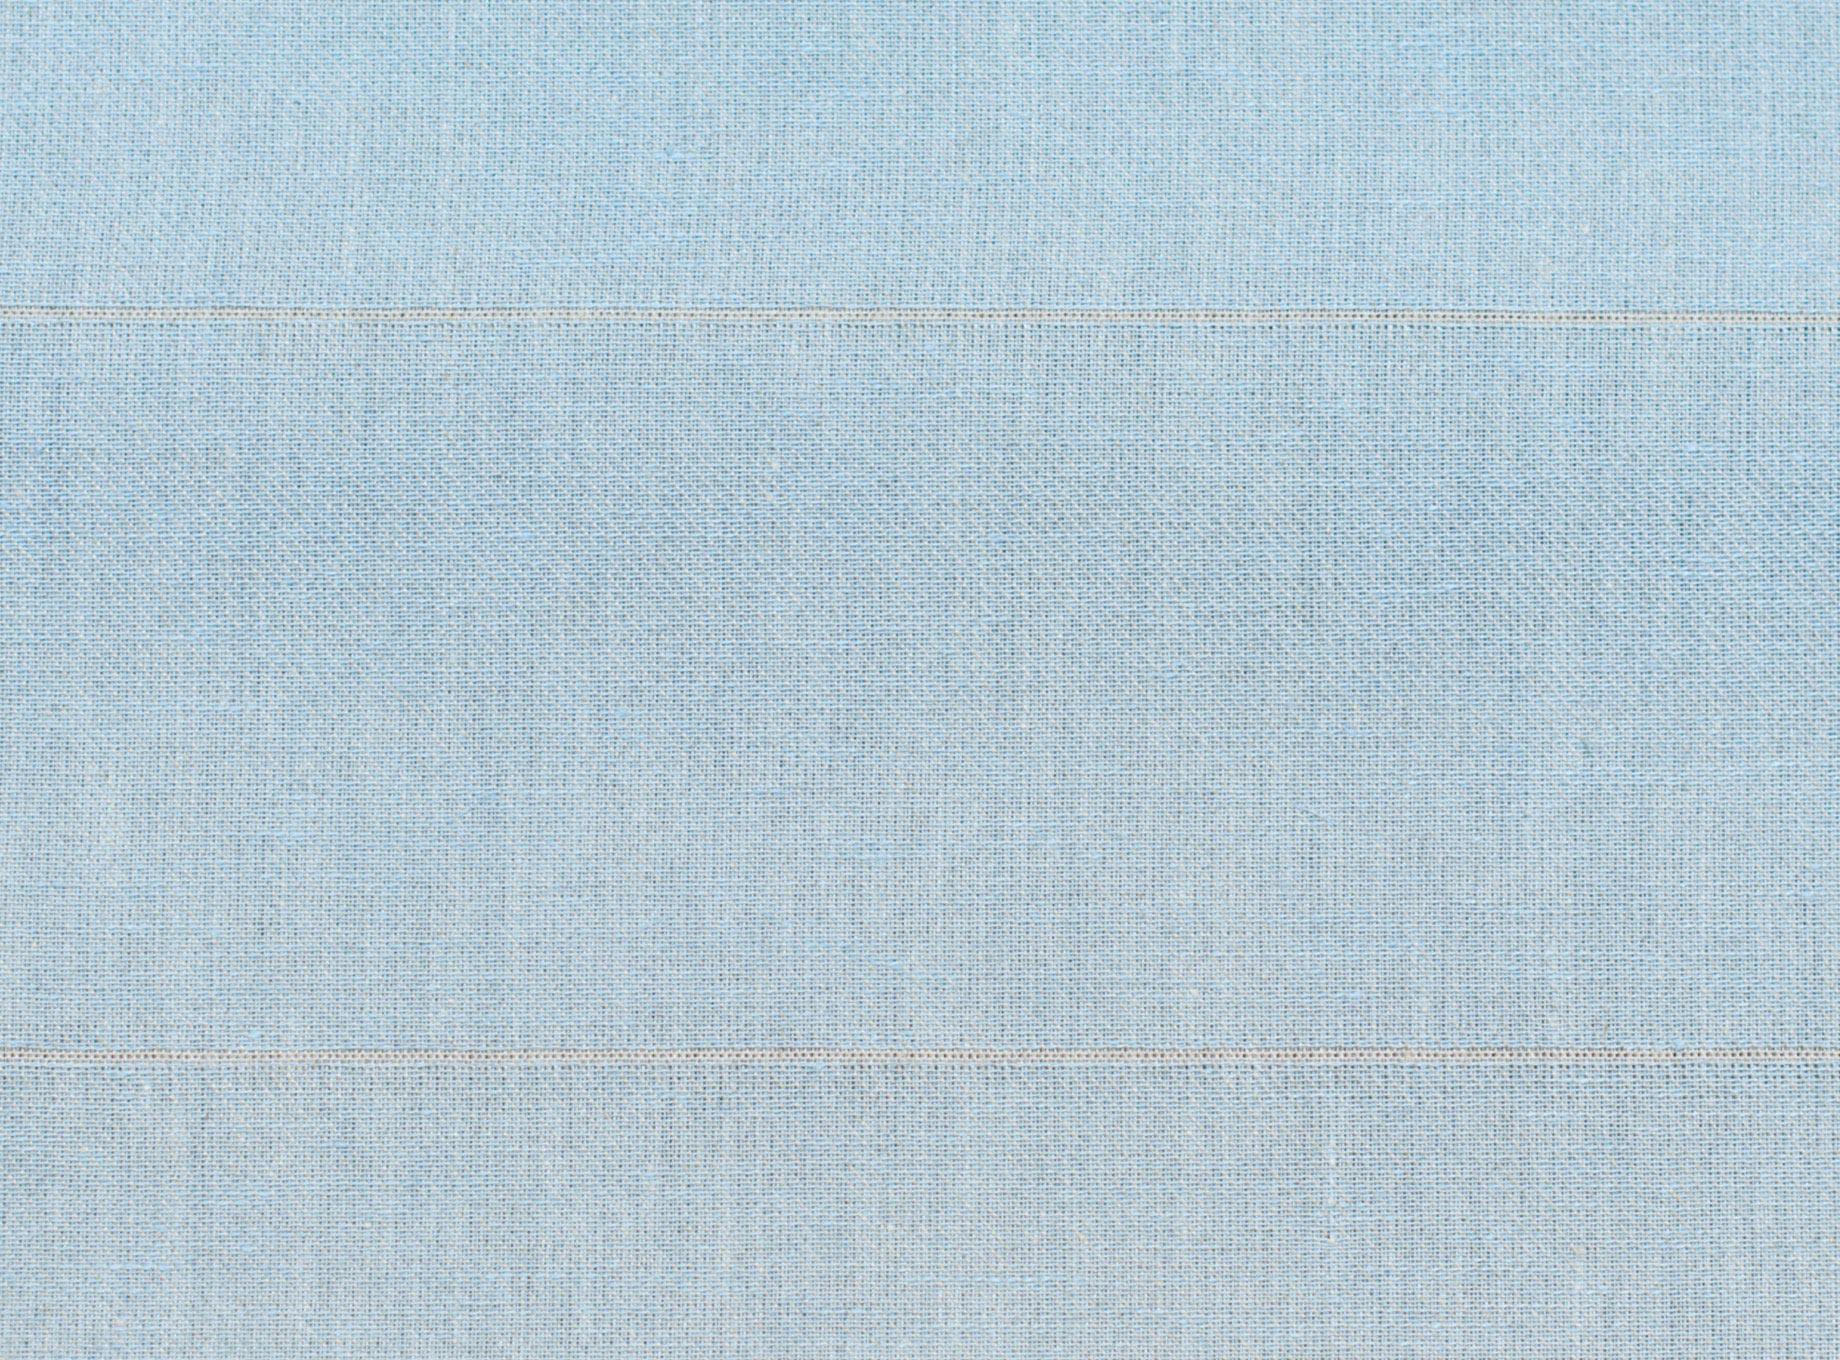 Duk Askerön Ljusblå